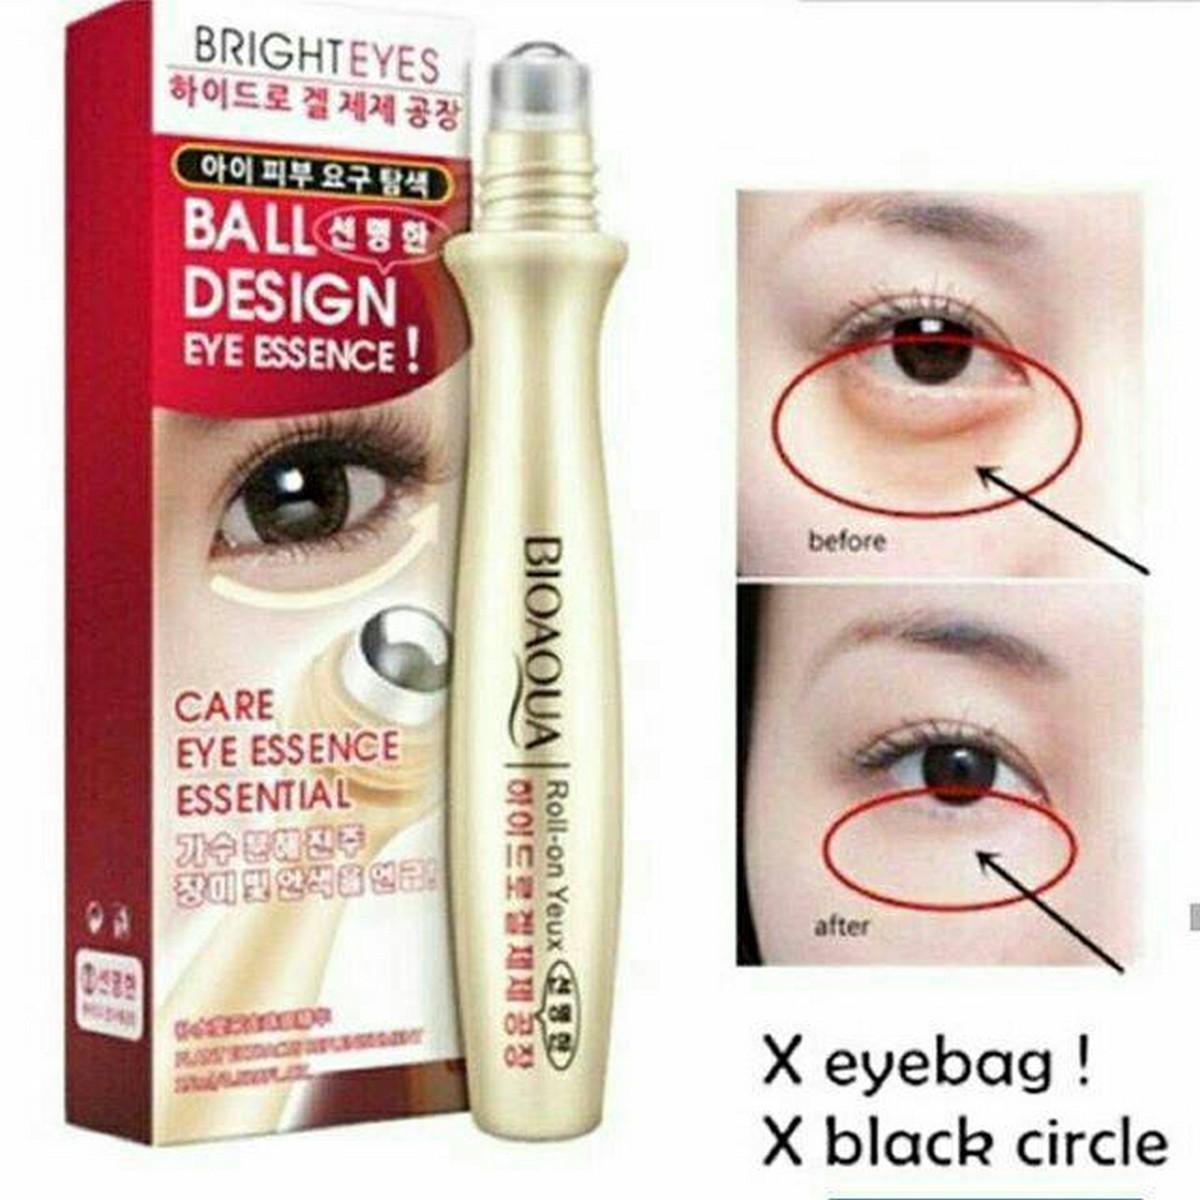 Bio Aqua 100% Original Anti-Wrinkle Puffiness Eye Bag Removal Roll-On Eye Ball For Dark Circle Skin Care 15ml- BA